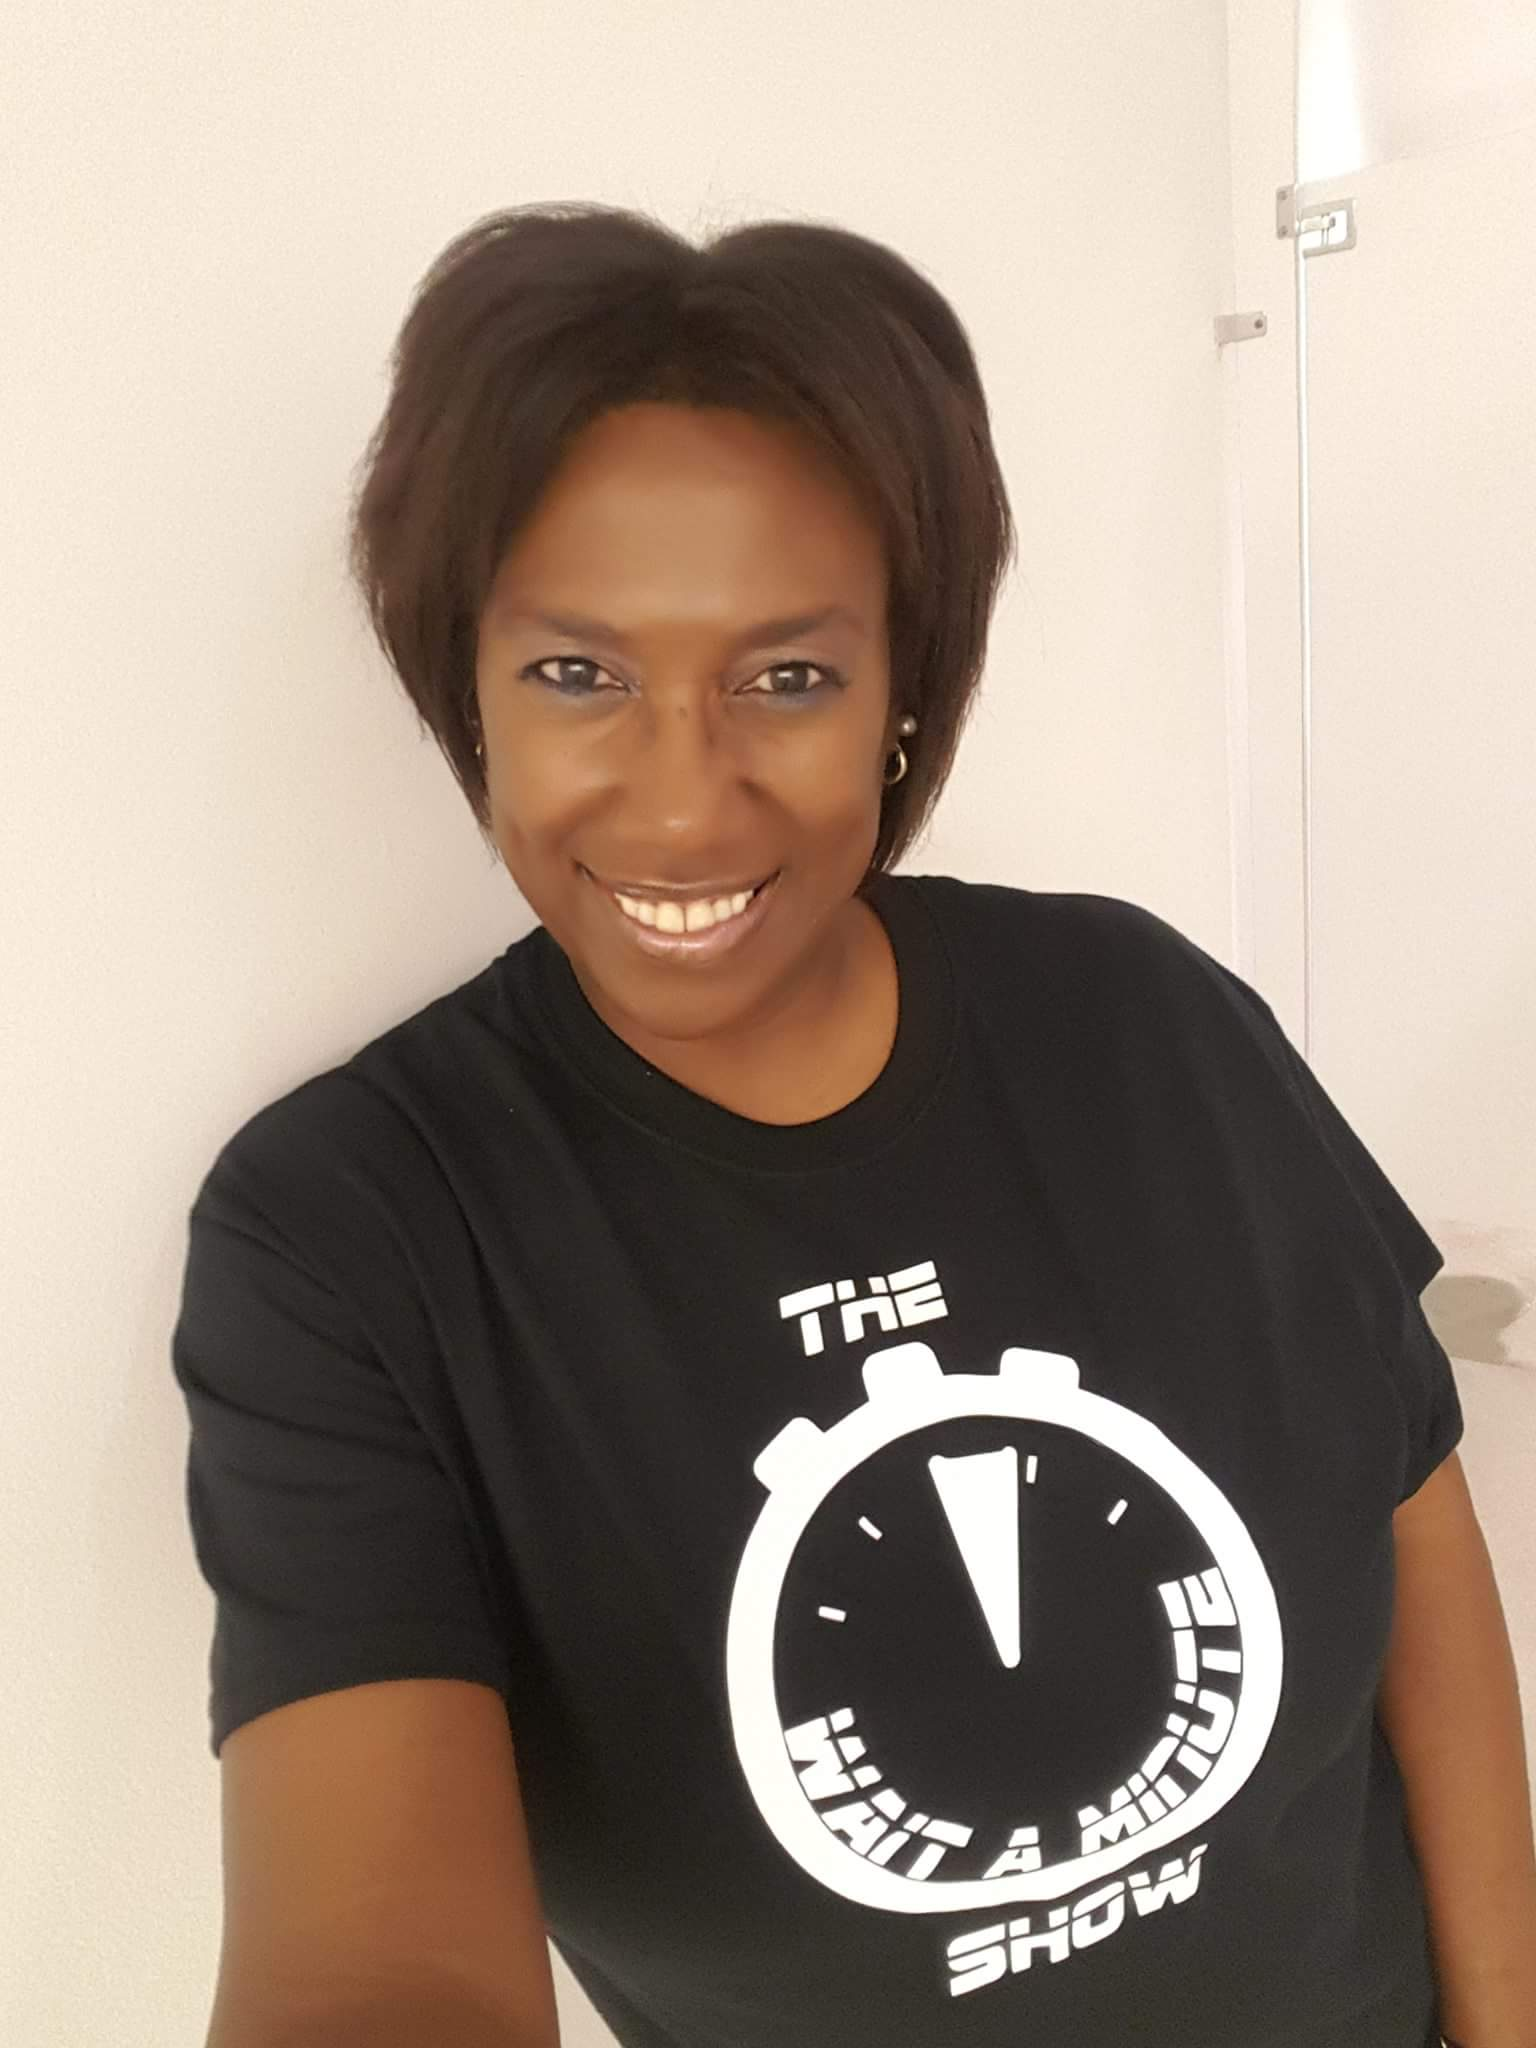 T-Shirt Winner Ms. Mocha